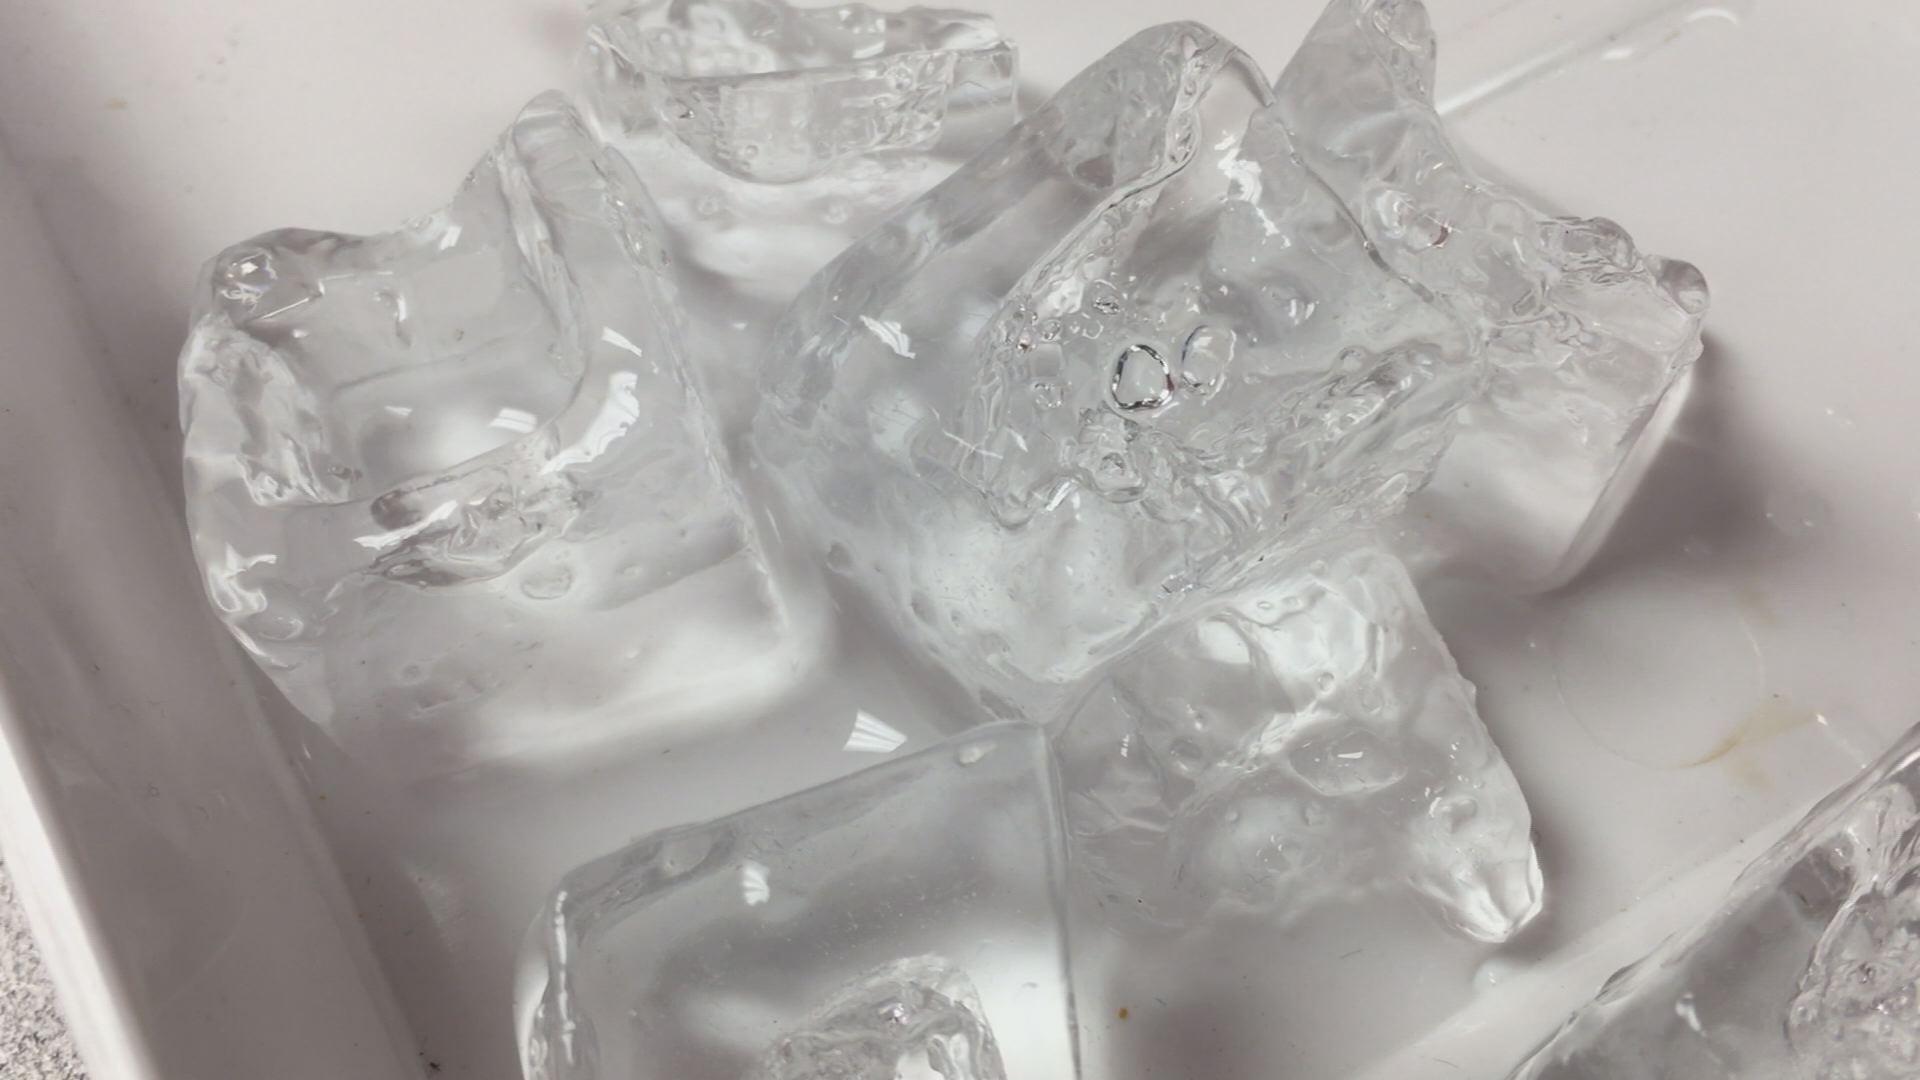 Salt and Ice Challenge_397014